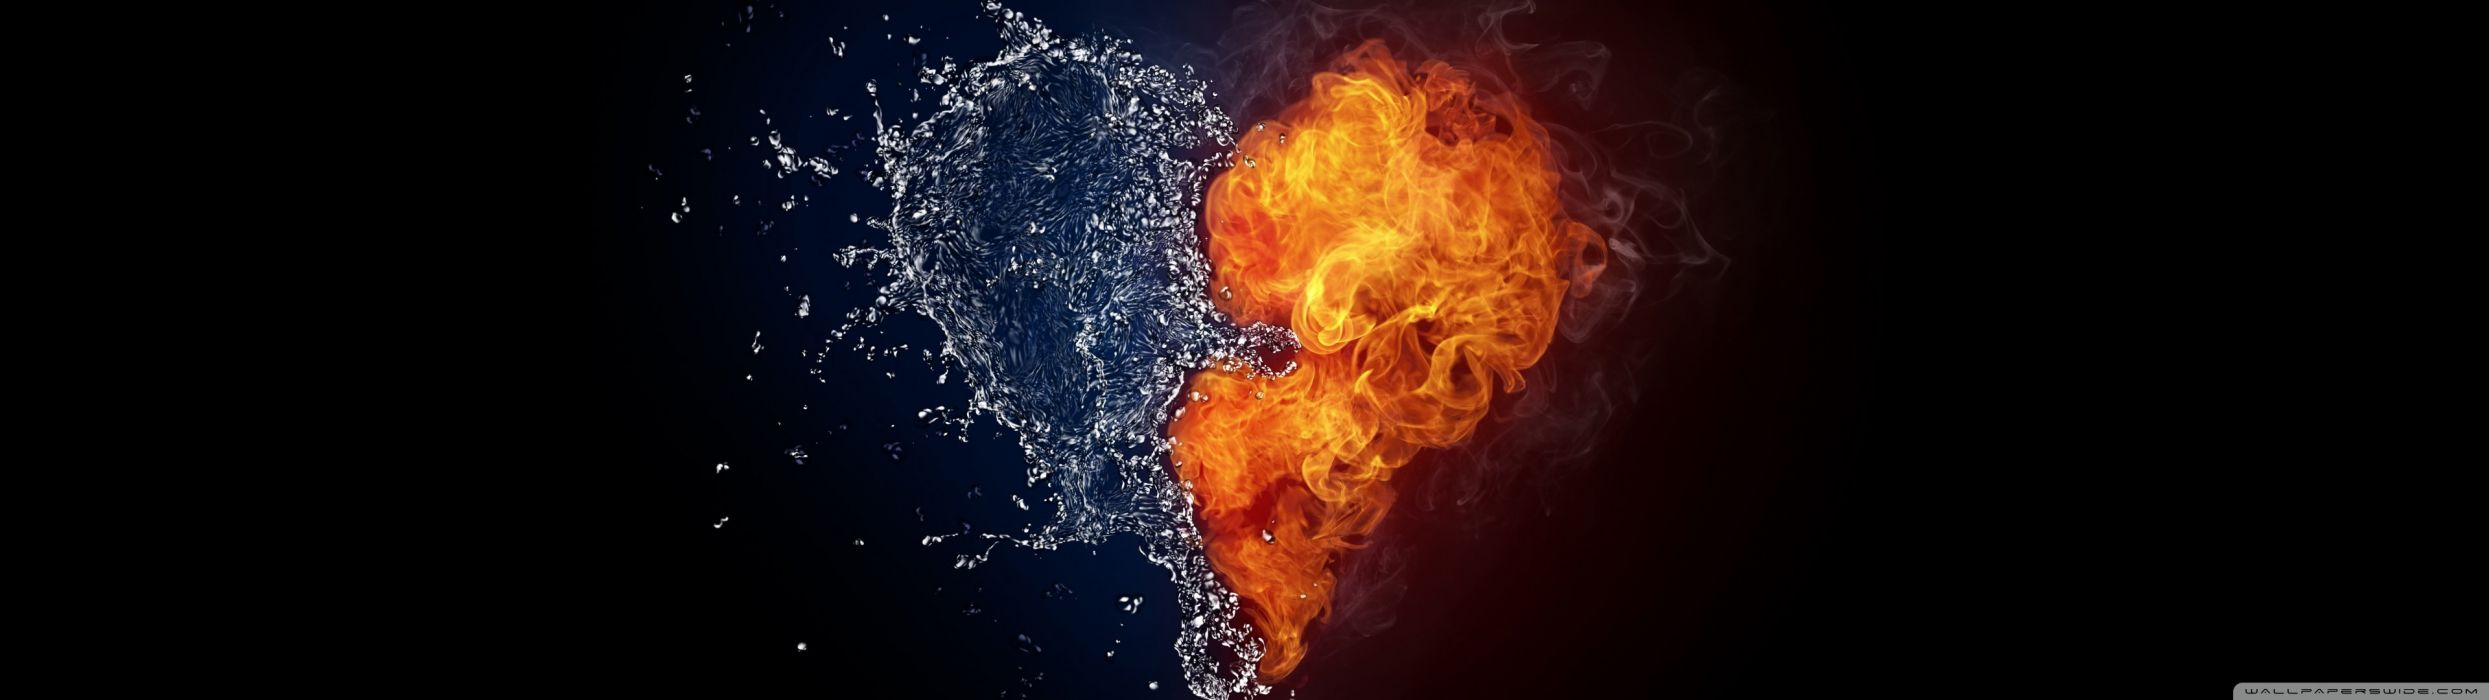 love amour coeur heart dual monitor screen multi multiple fire feu water eau wallpaper